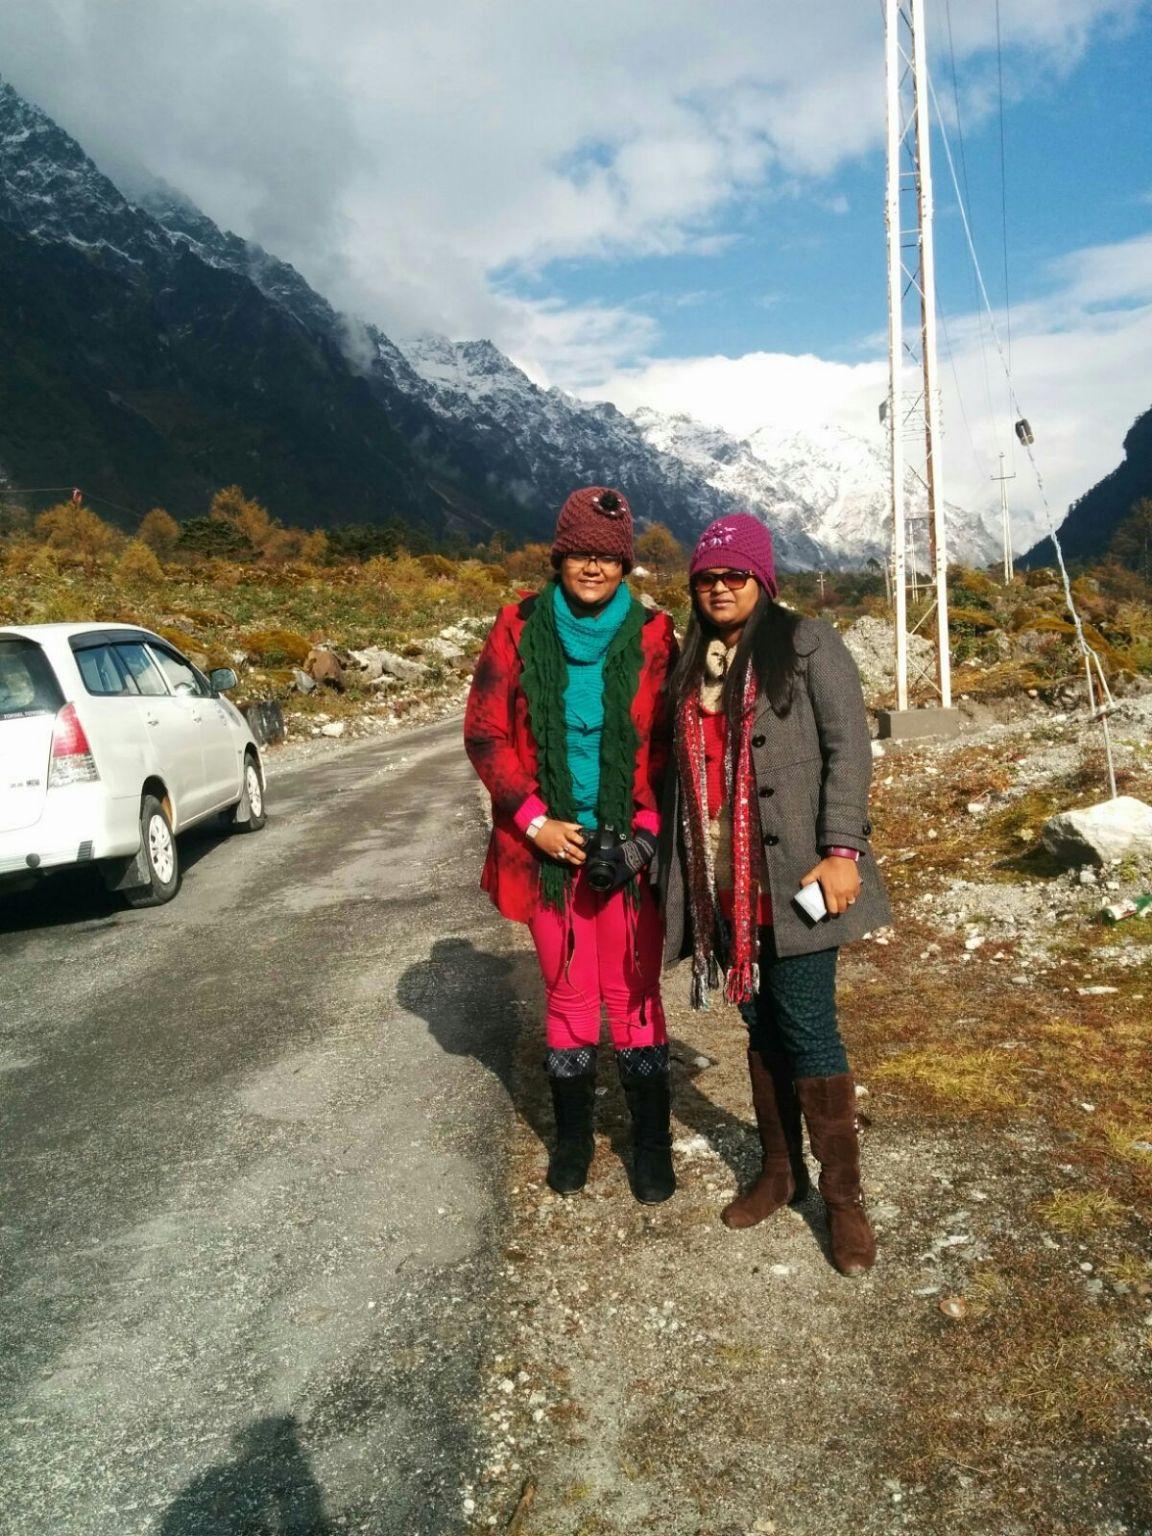 Photo of Yumthang By Priyanka Singh